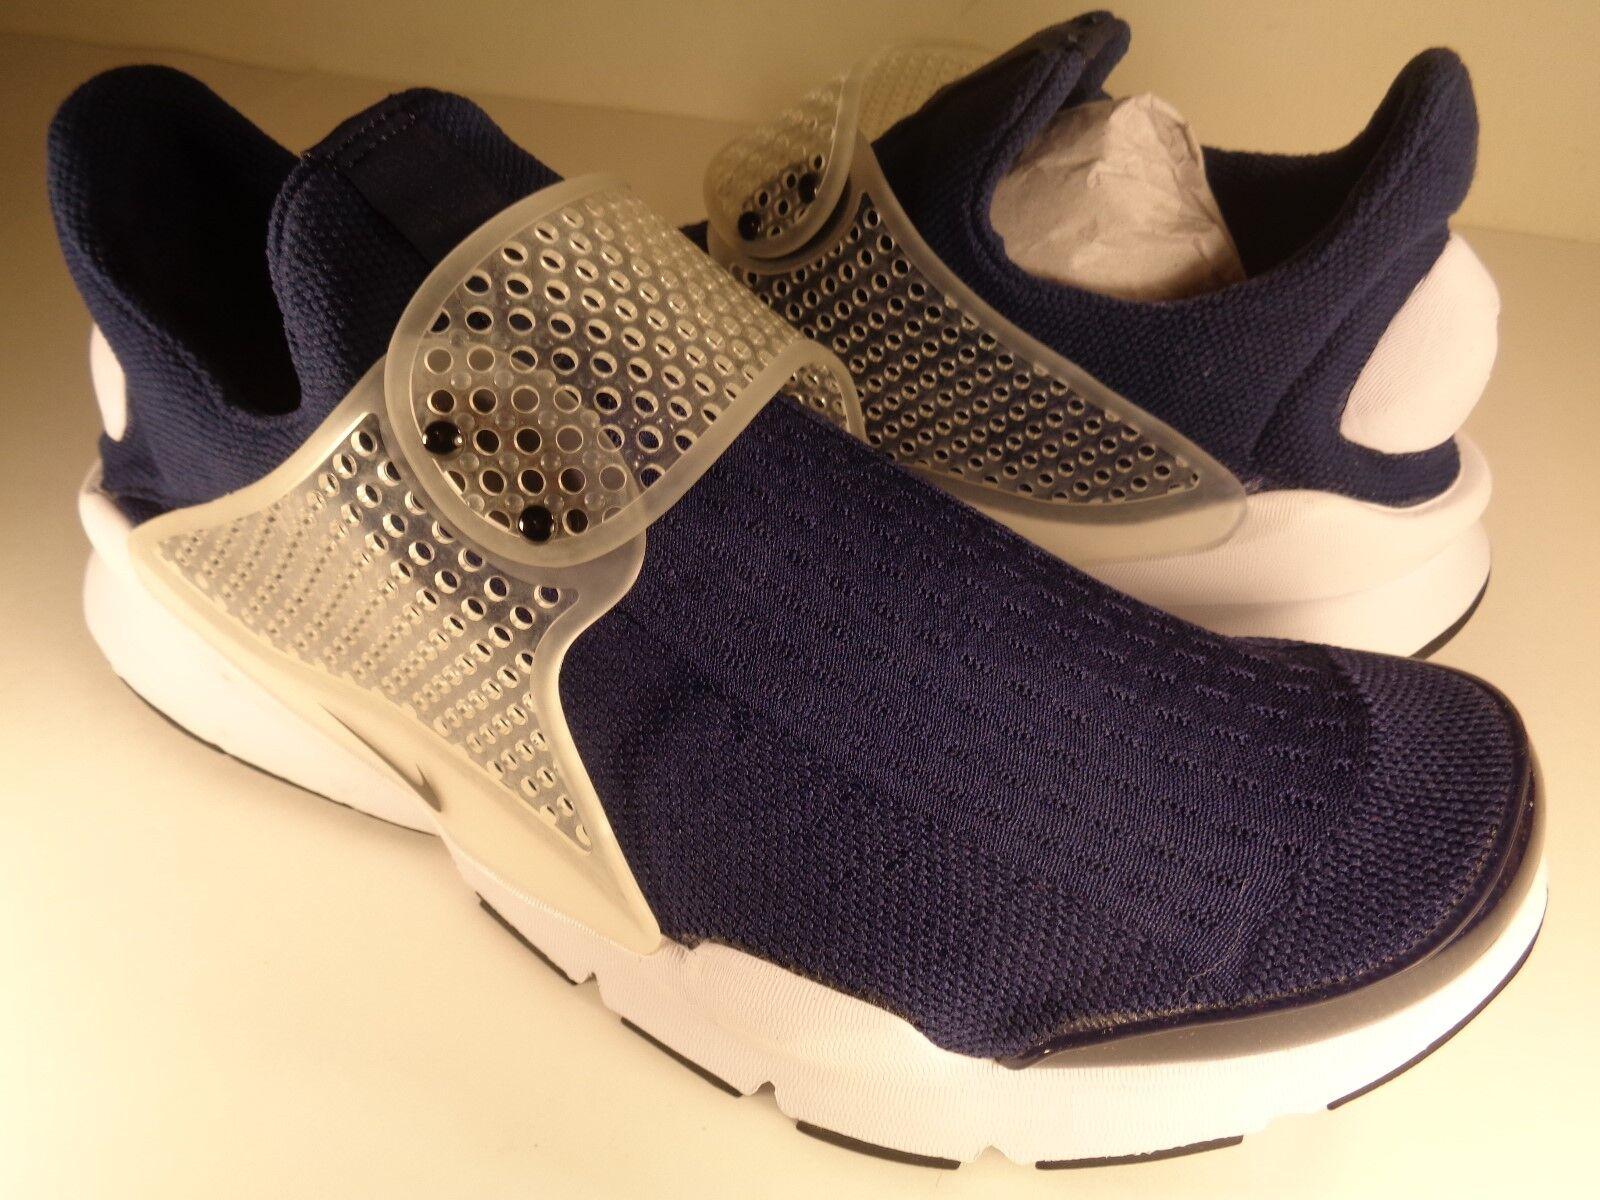 Nike Sock Dart gris blanco Midnight Navy SZ 10 (819686-400)